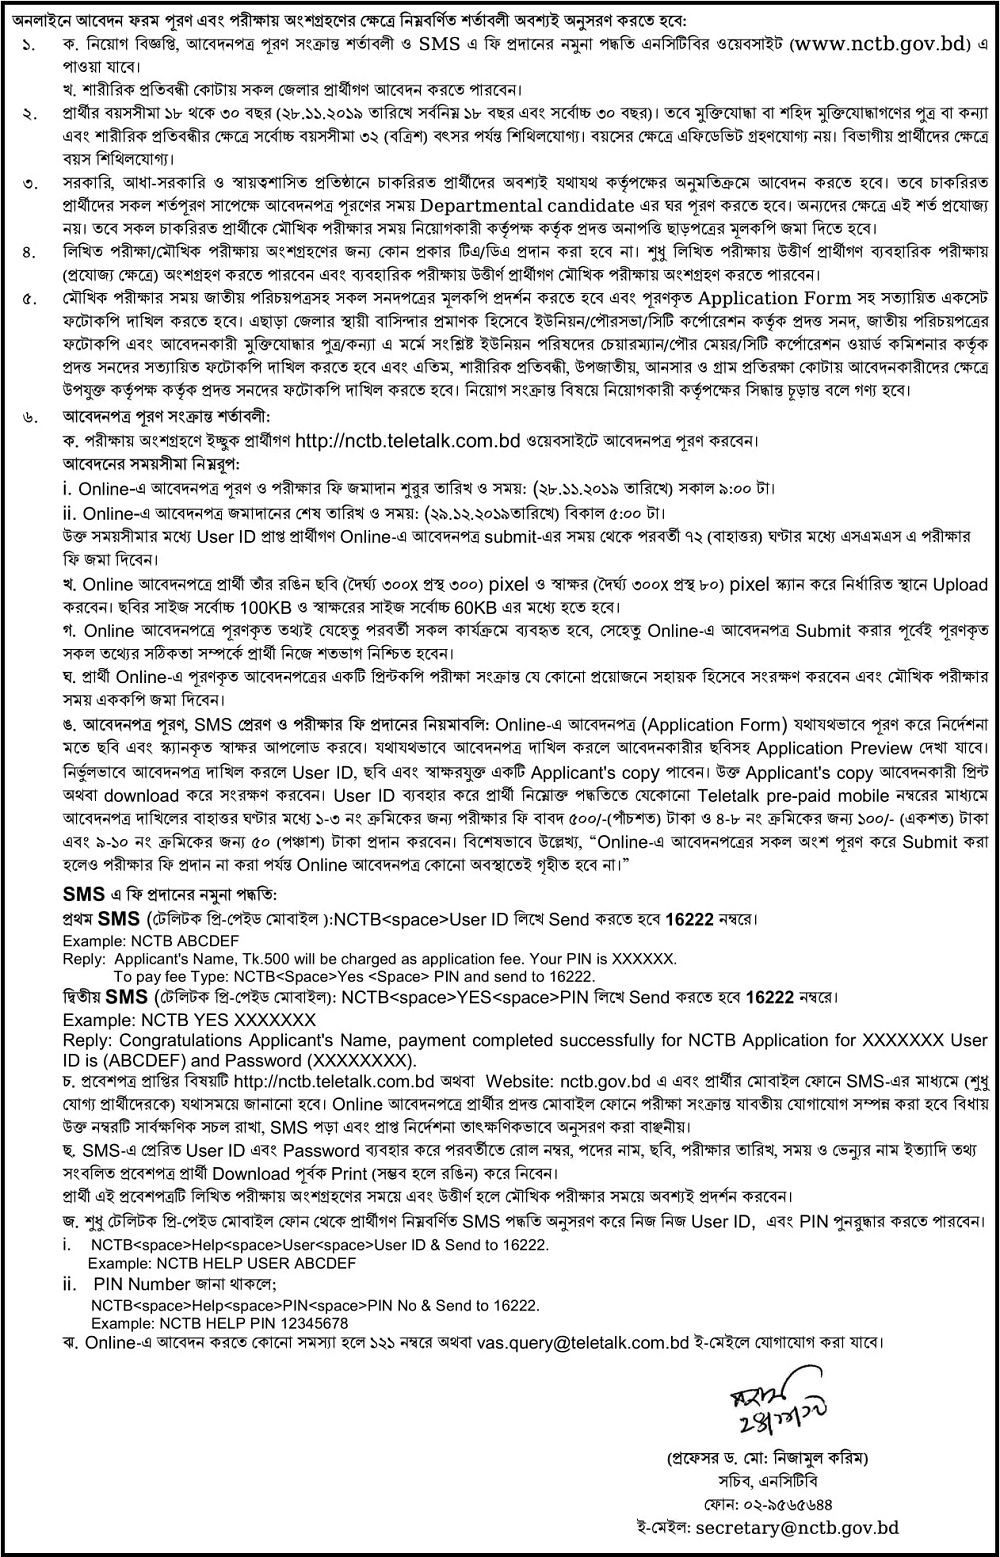 NCTB Job Circular 2019-2